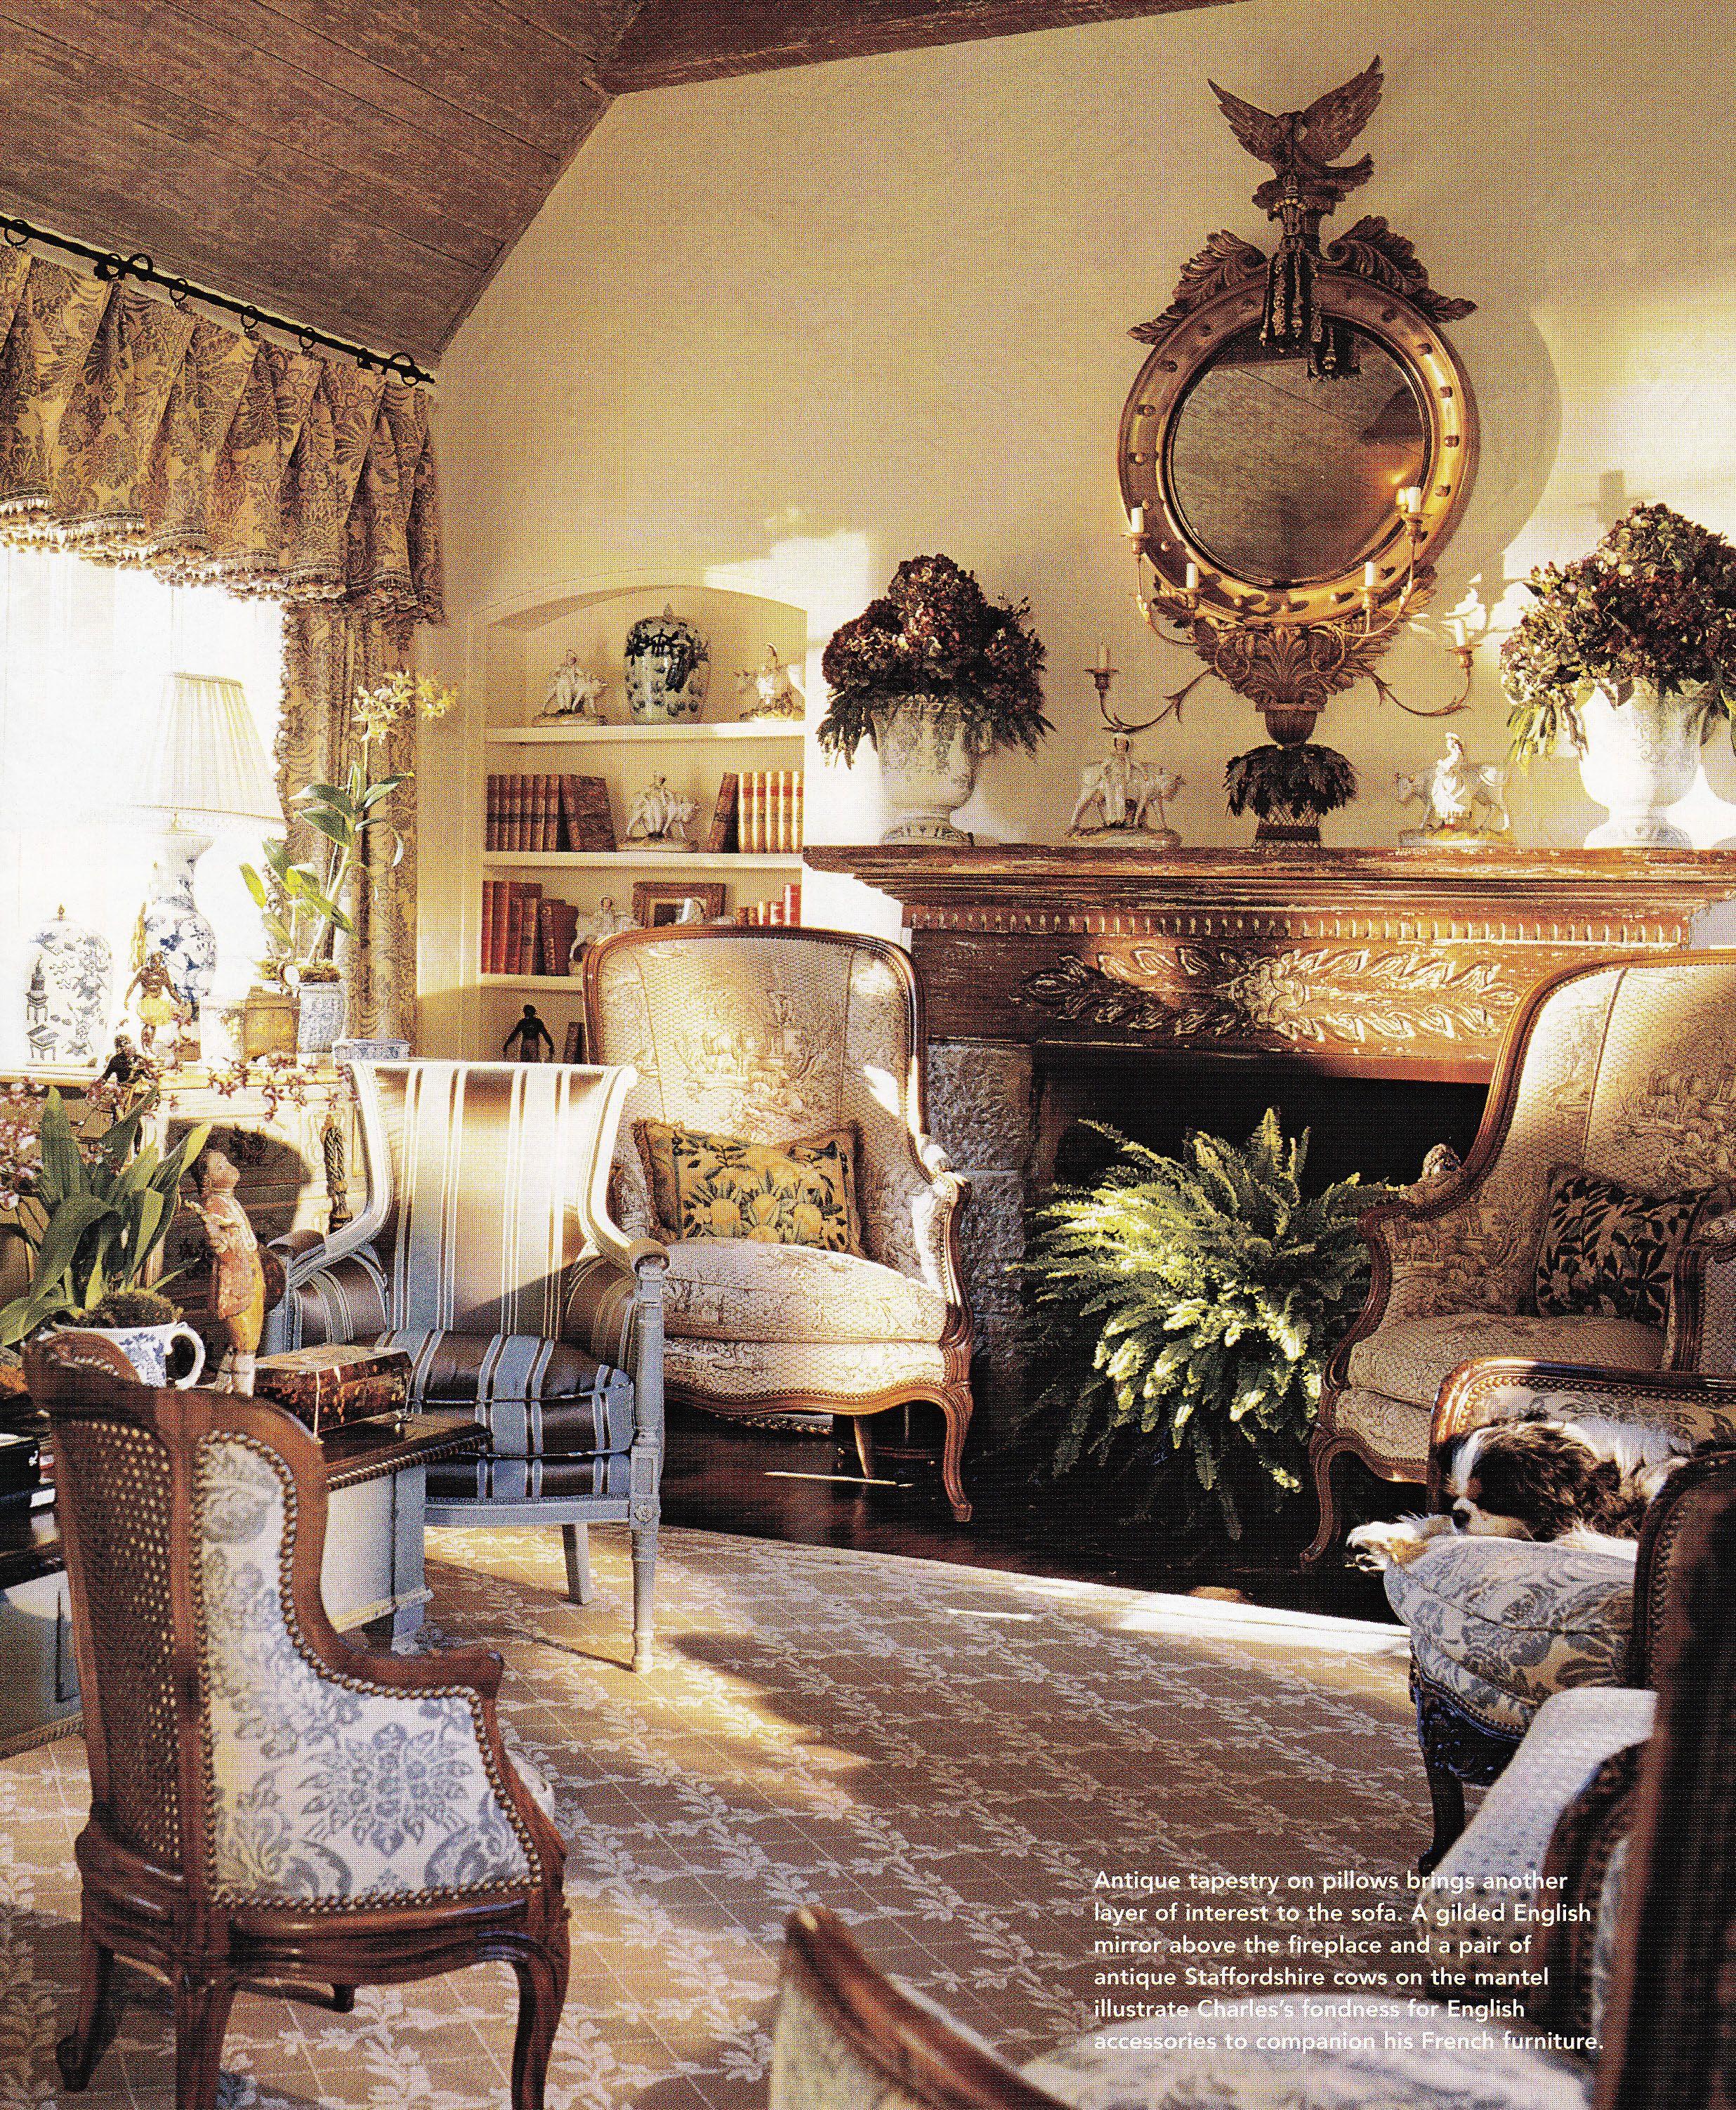 Charles Faudree. Traditional Home May 2003